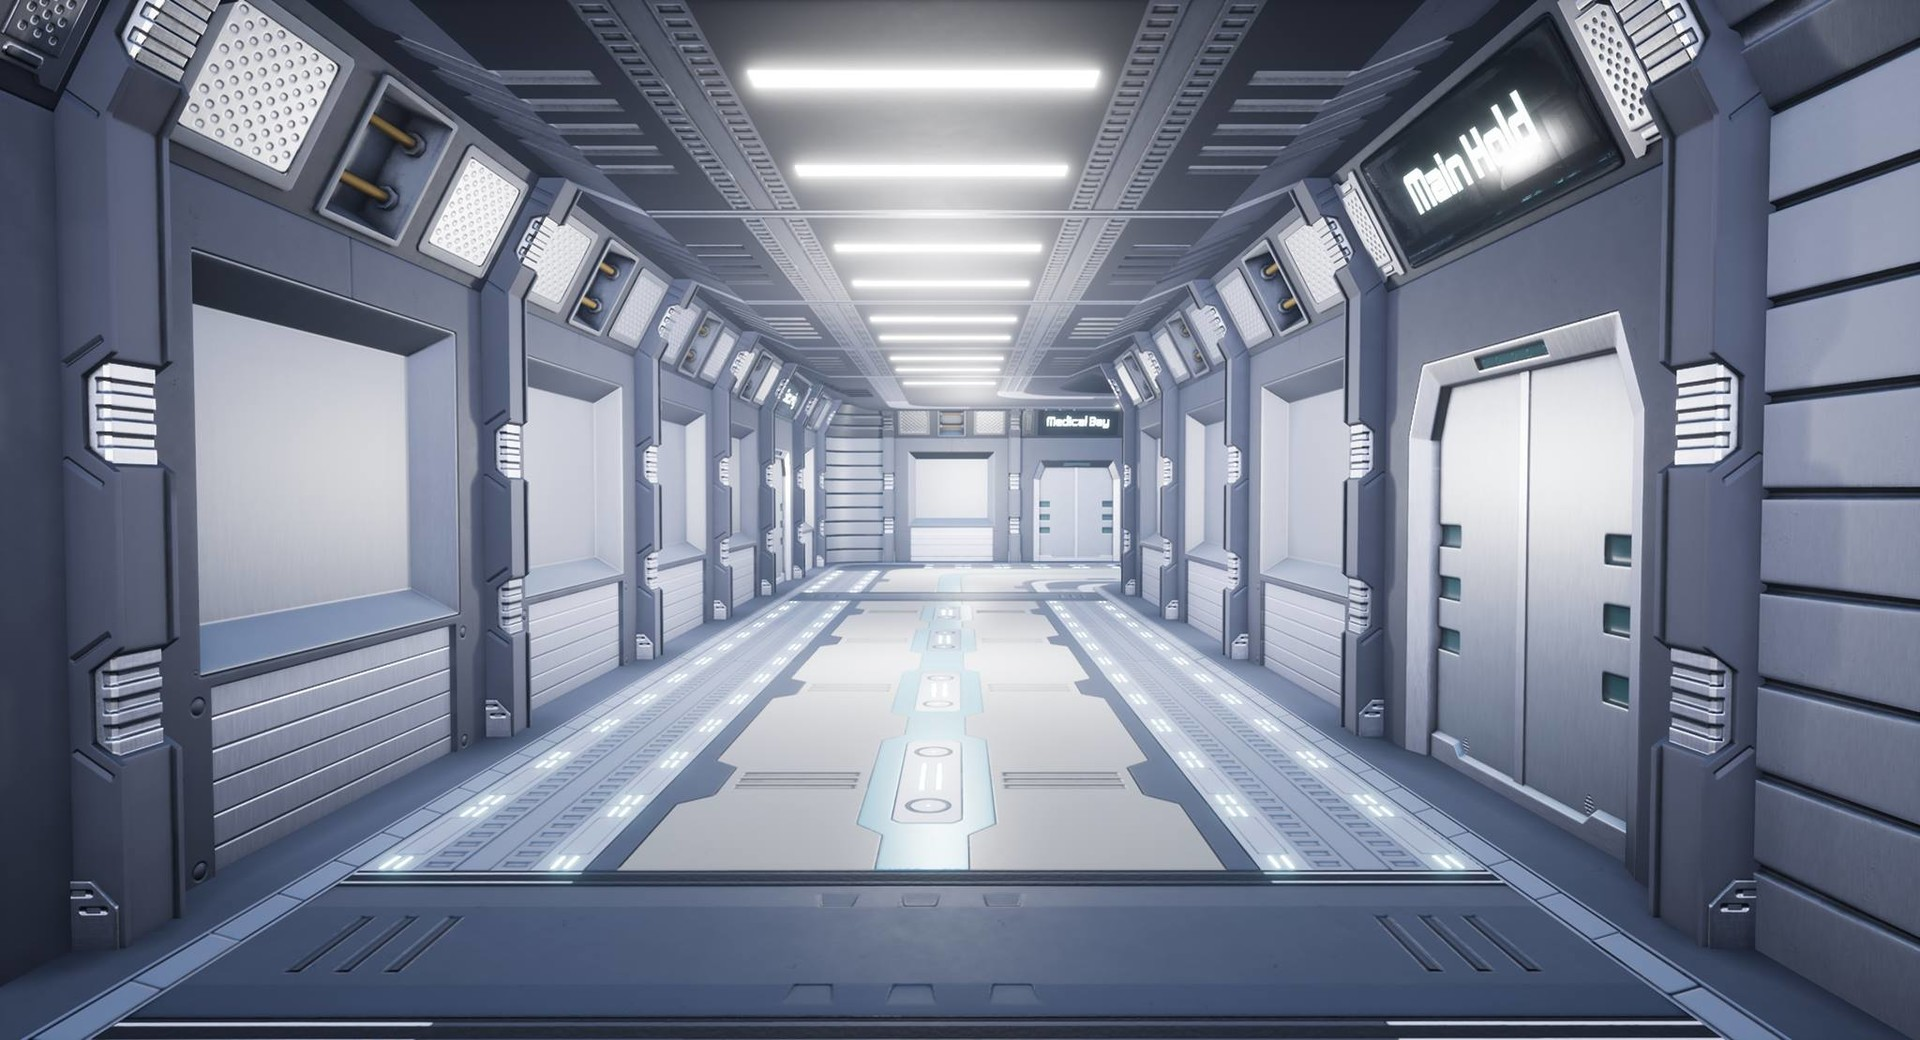 Sci Fi hallway long view